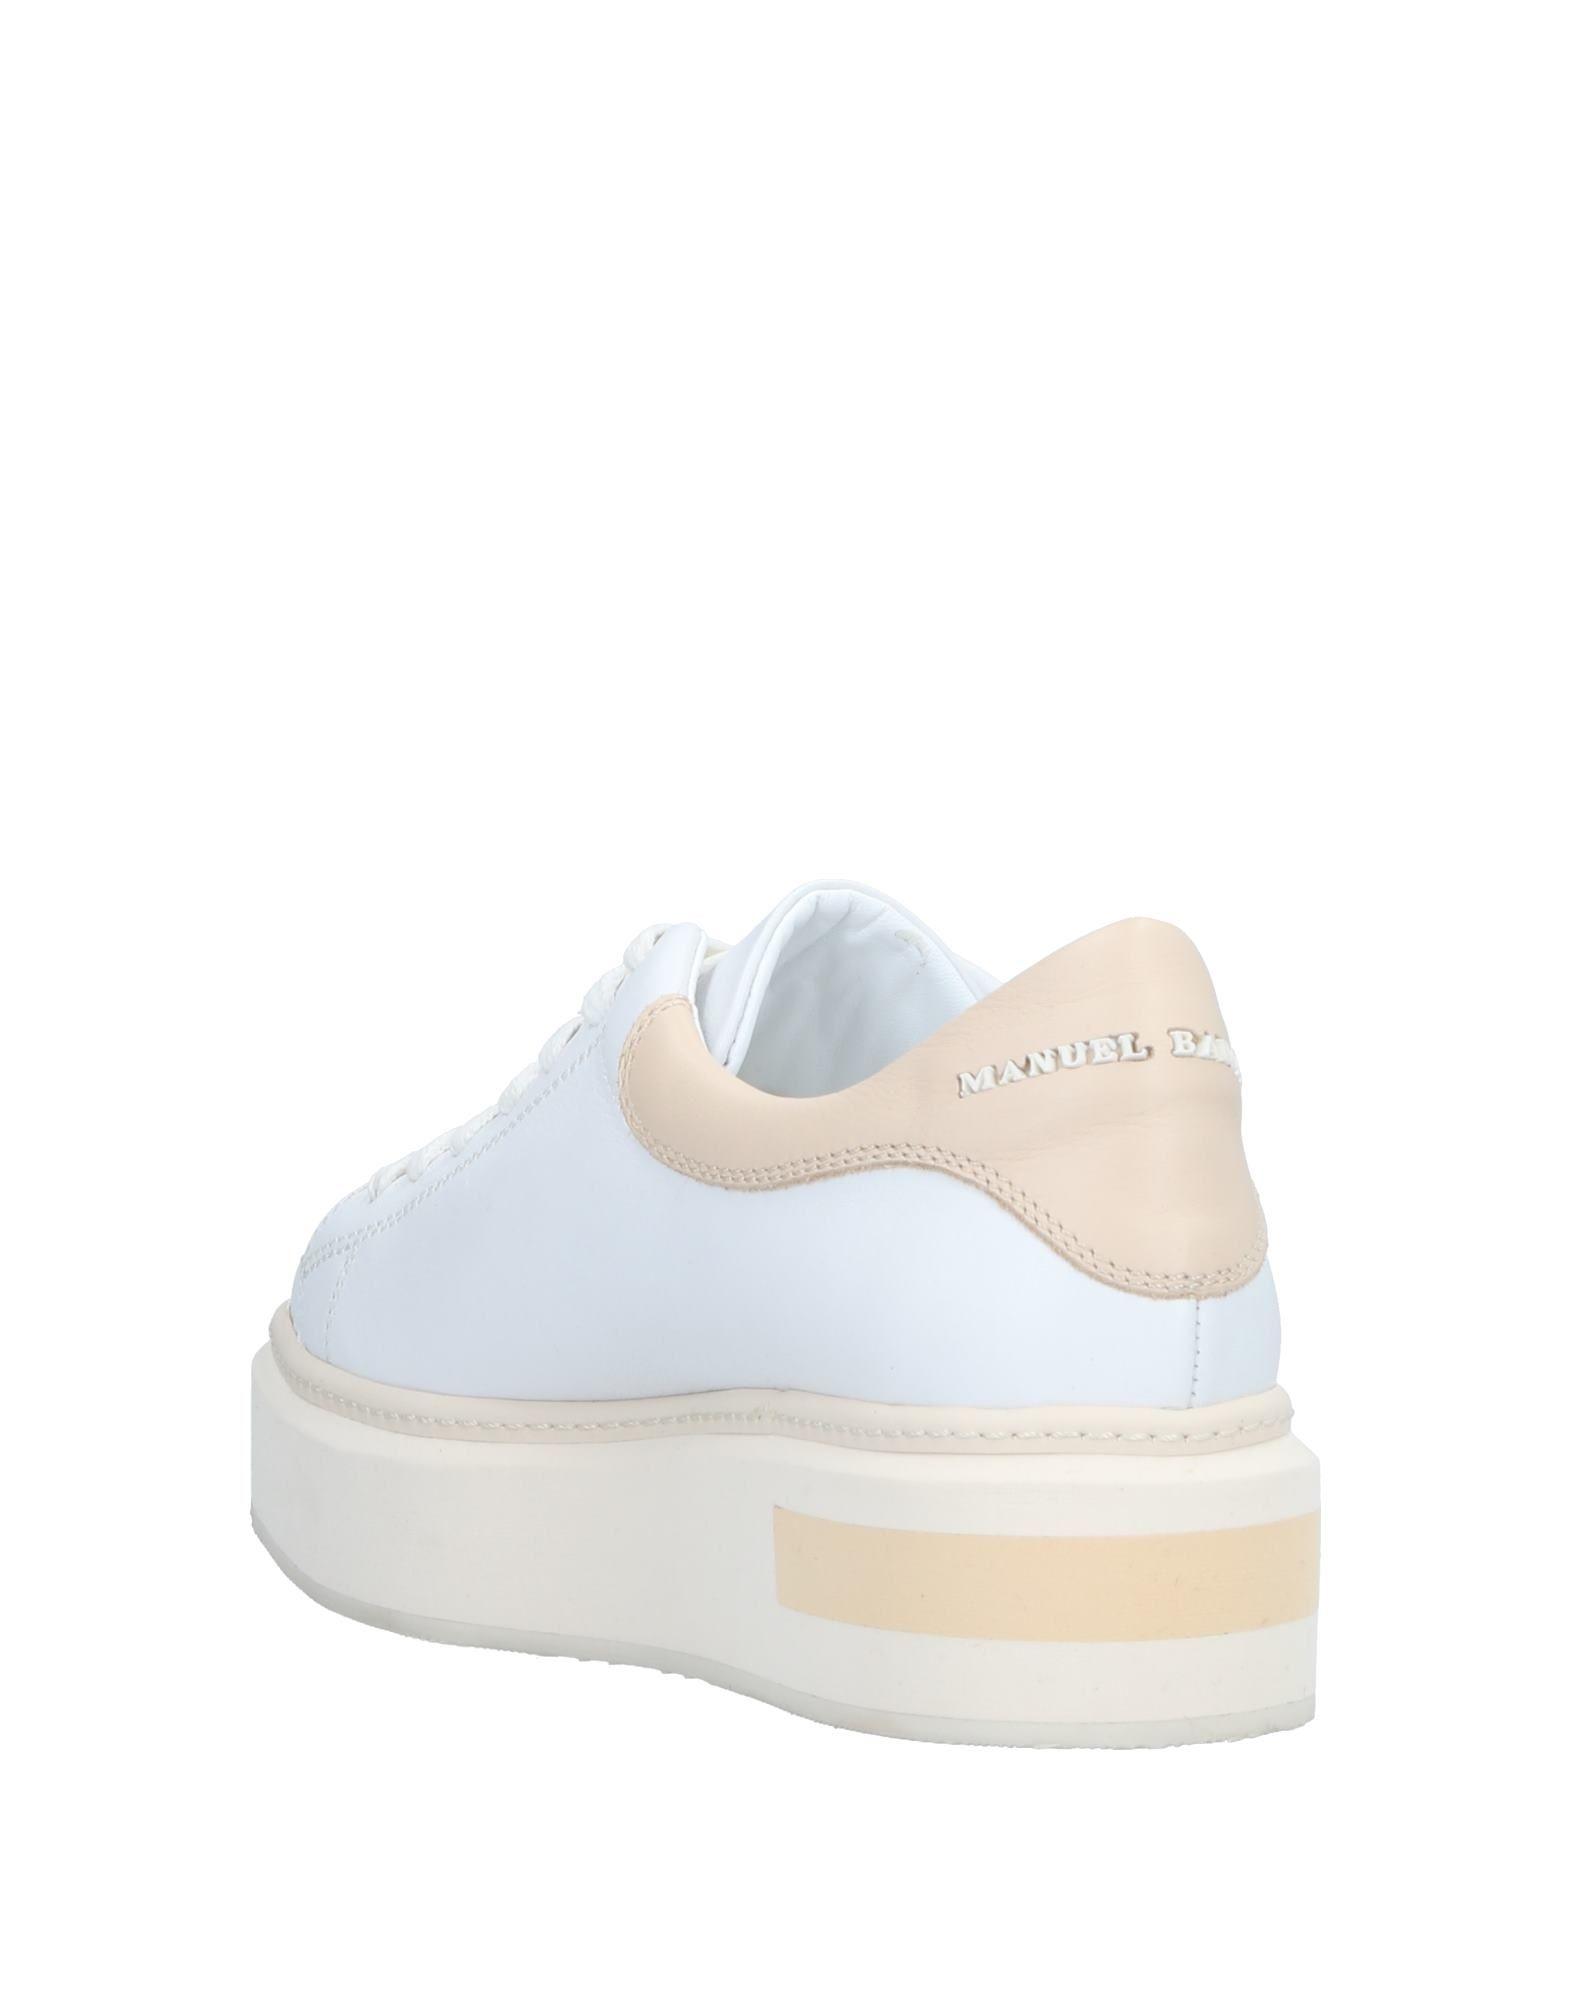 Stilvolle billige Schuhe Damen Manuel Barceló Sneakers Damen Schuhe  11538954HT 3cfc5f